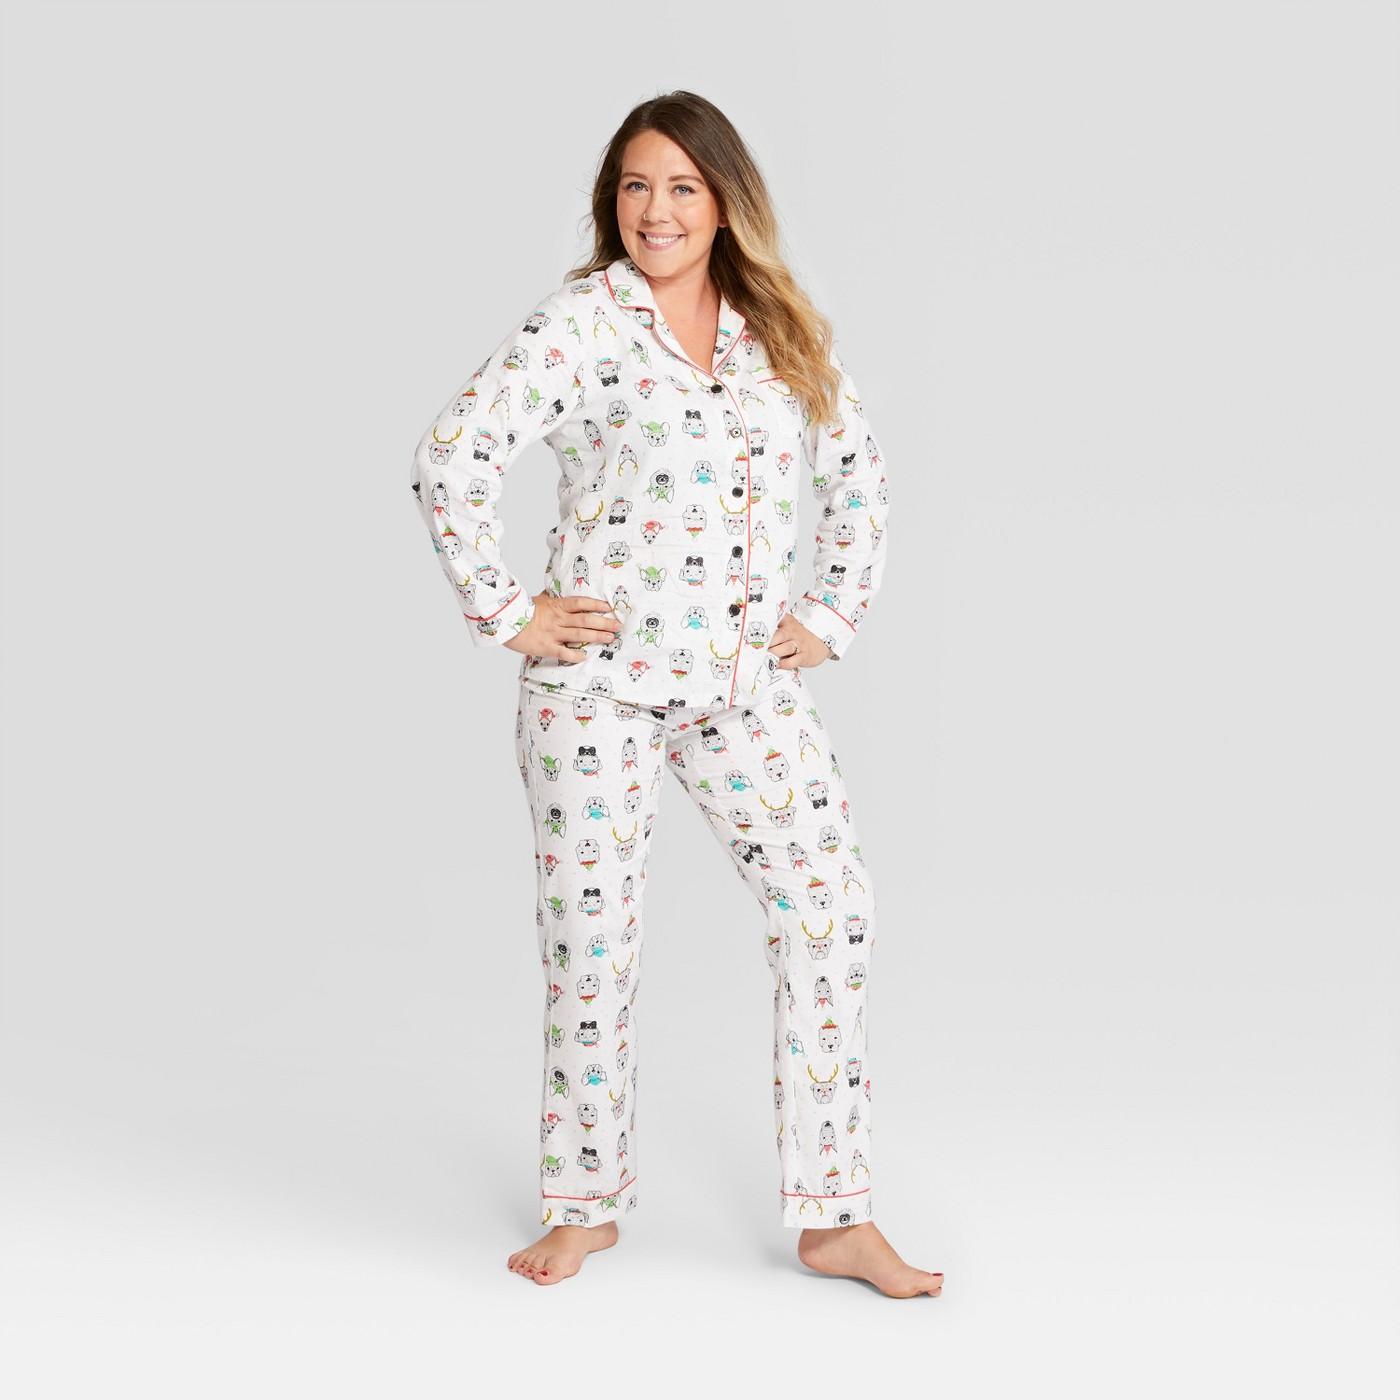 Women's Animal Print Holiday Festive Dogs Notch Collar Pajama Set - Wondershop™ White - image 1 of 3